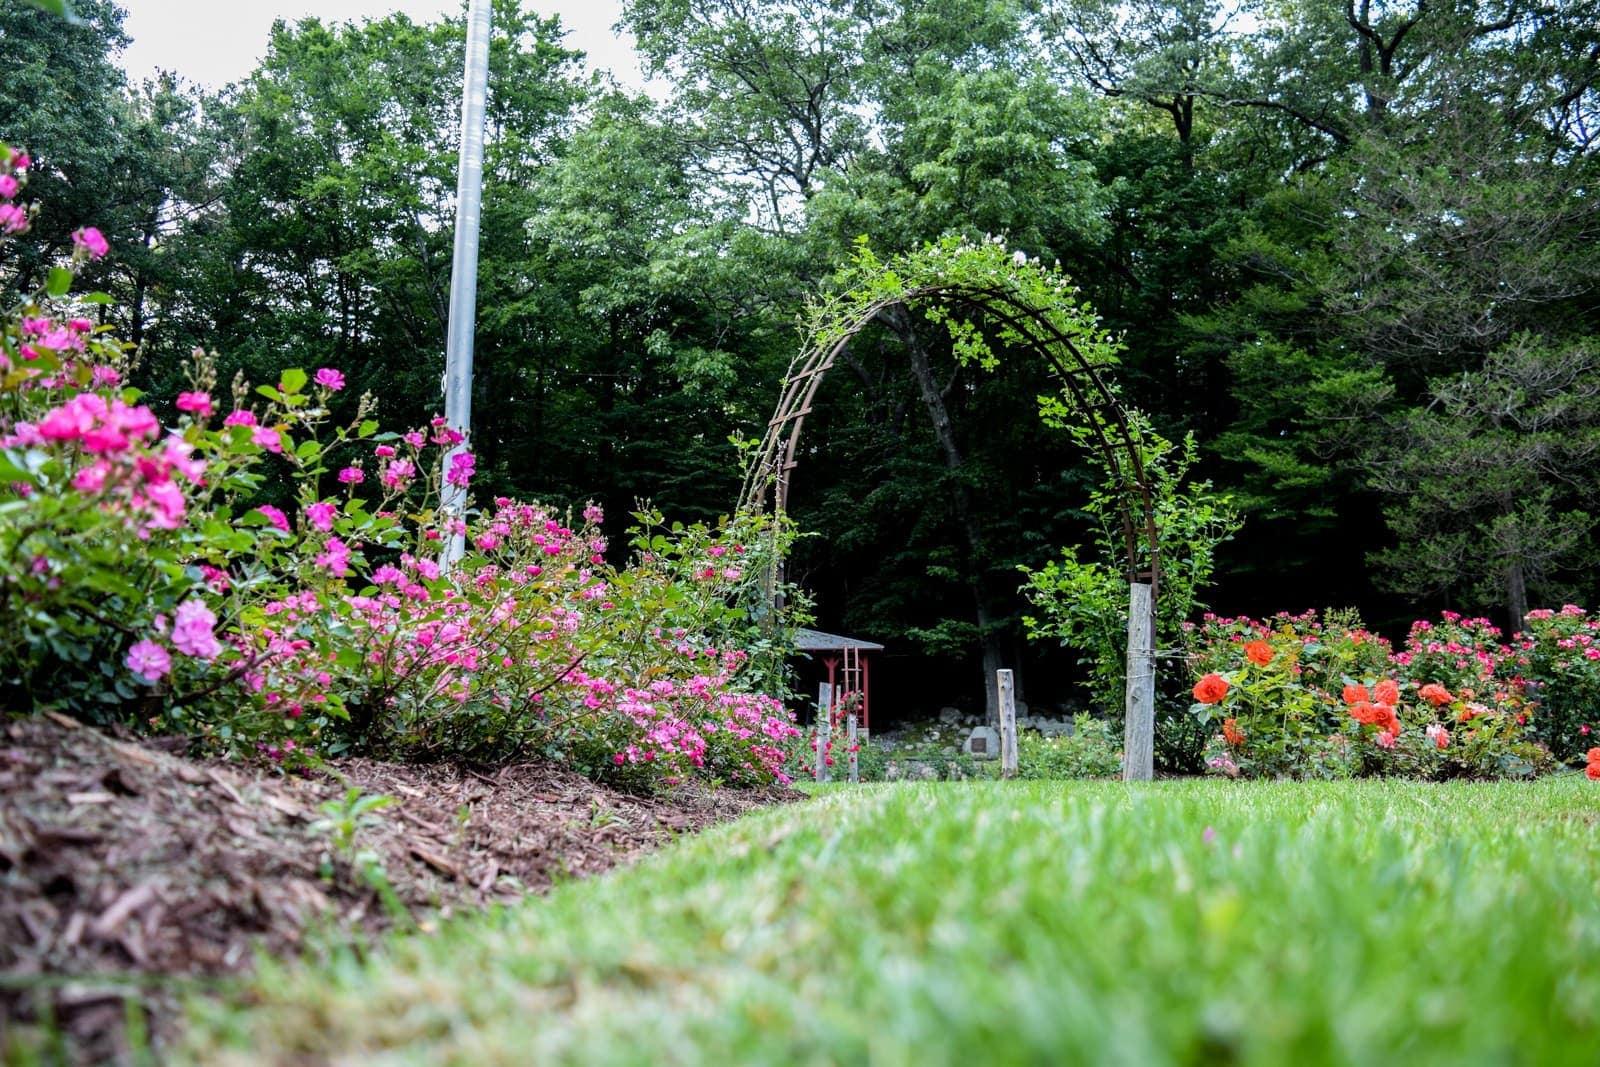 Veterans Memorial Rose Garden